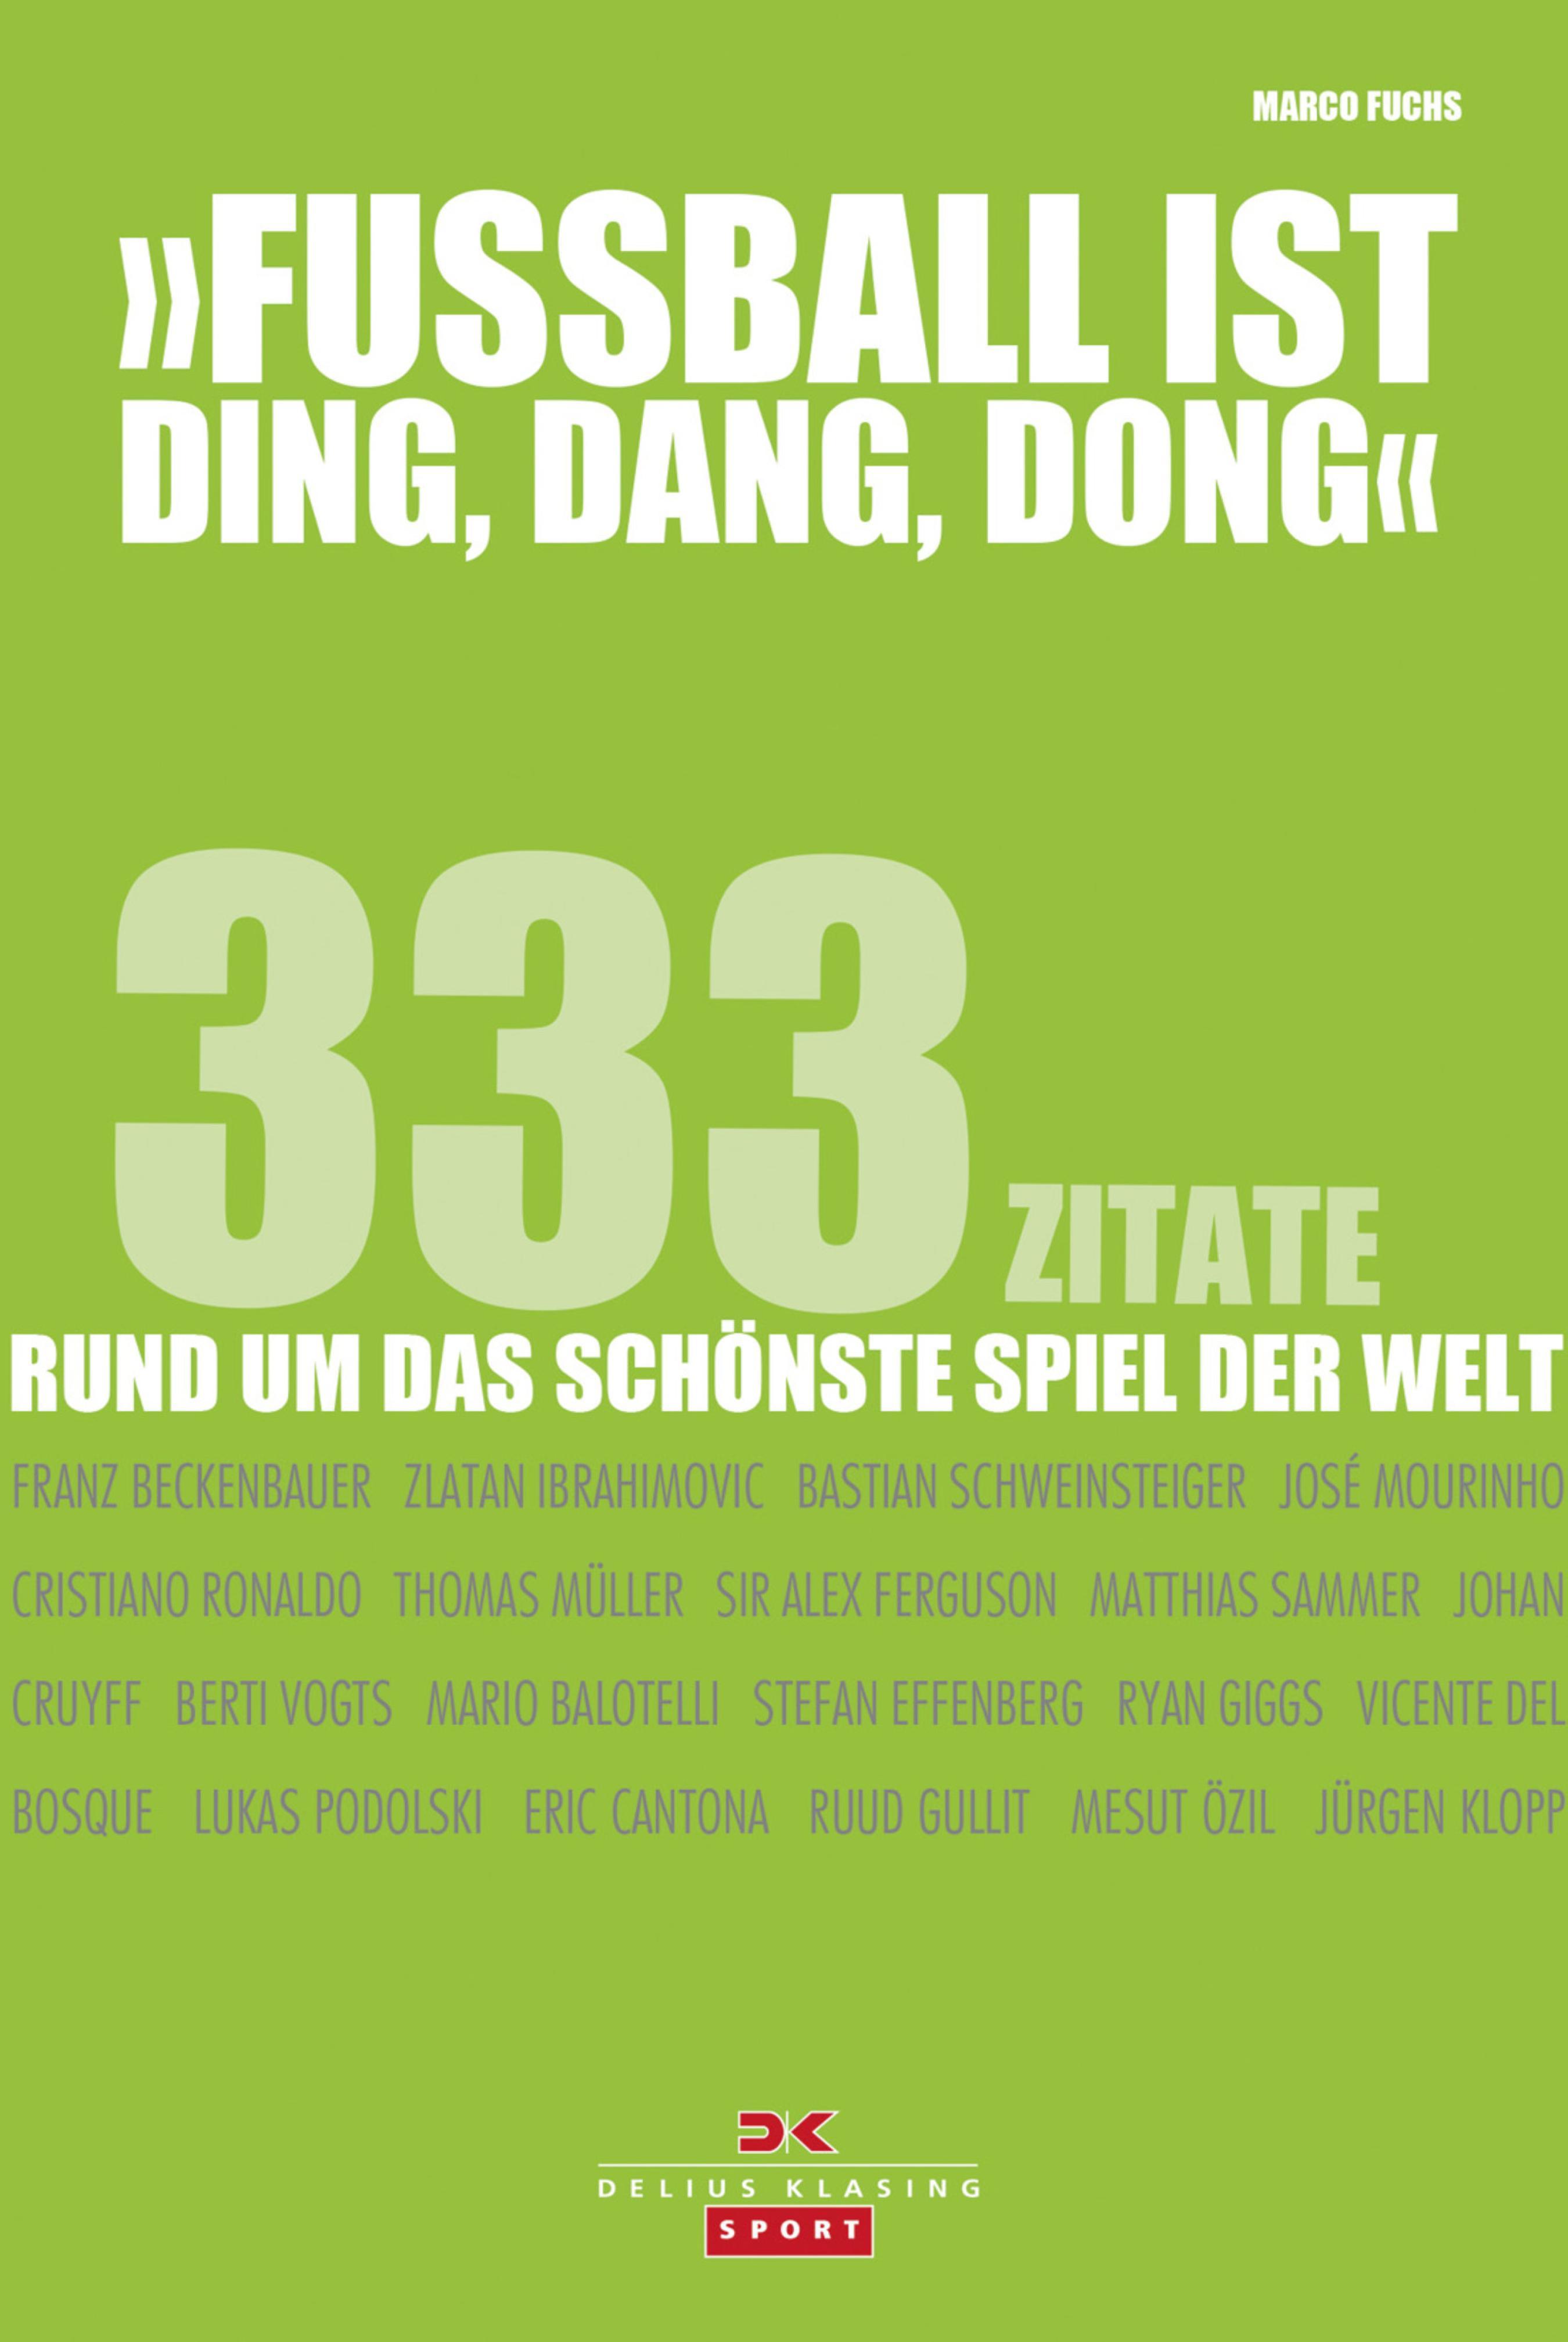 Marco Fuchs Fußball ist ding, dang, dong детские ткацкие станки аксессуары ding ding tong diy